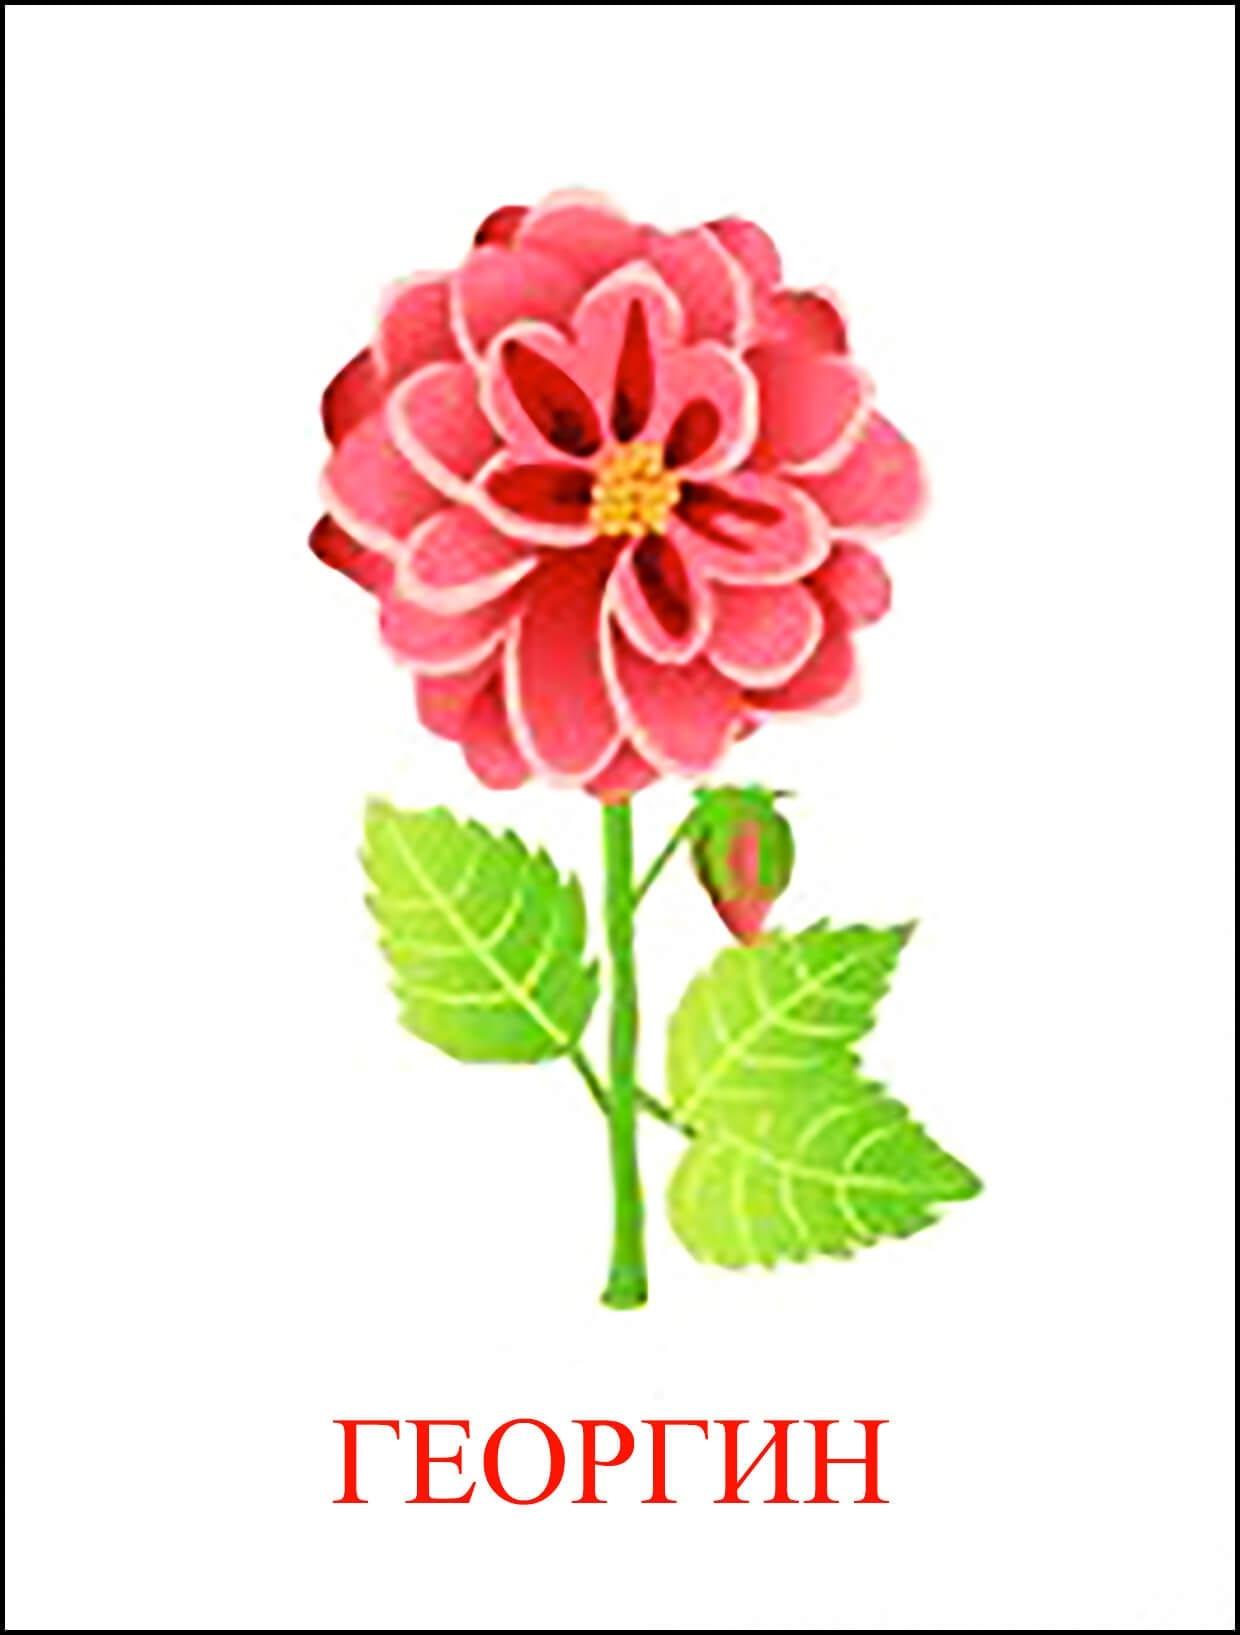 Рисунок цветка георгина